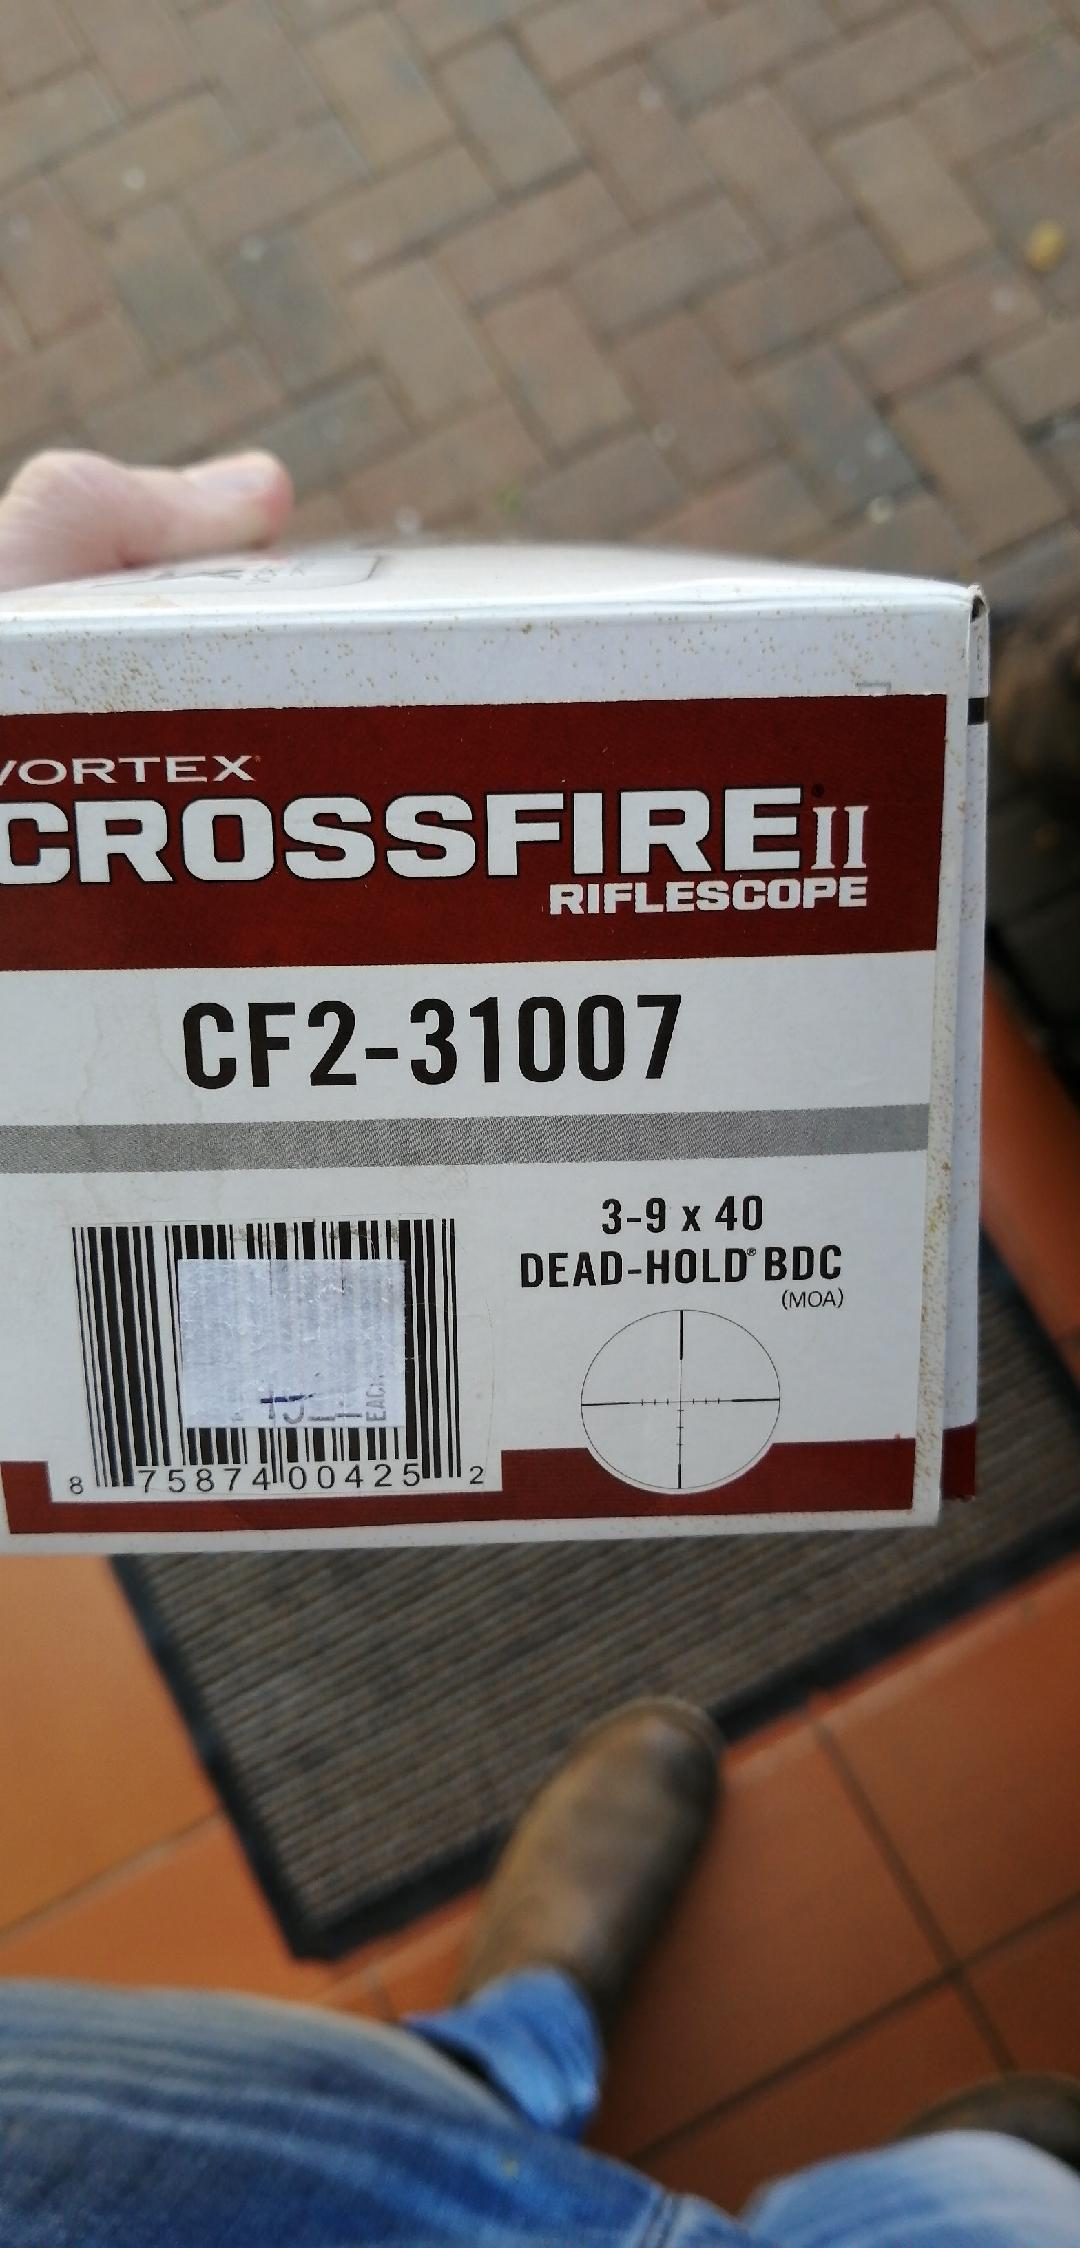 Vortex Crossfire II 3-9x40 Deadhold BDC Brand New